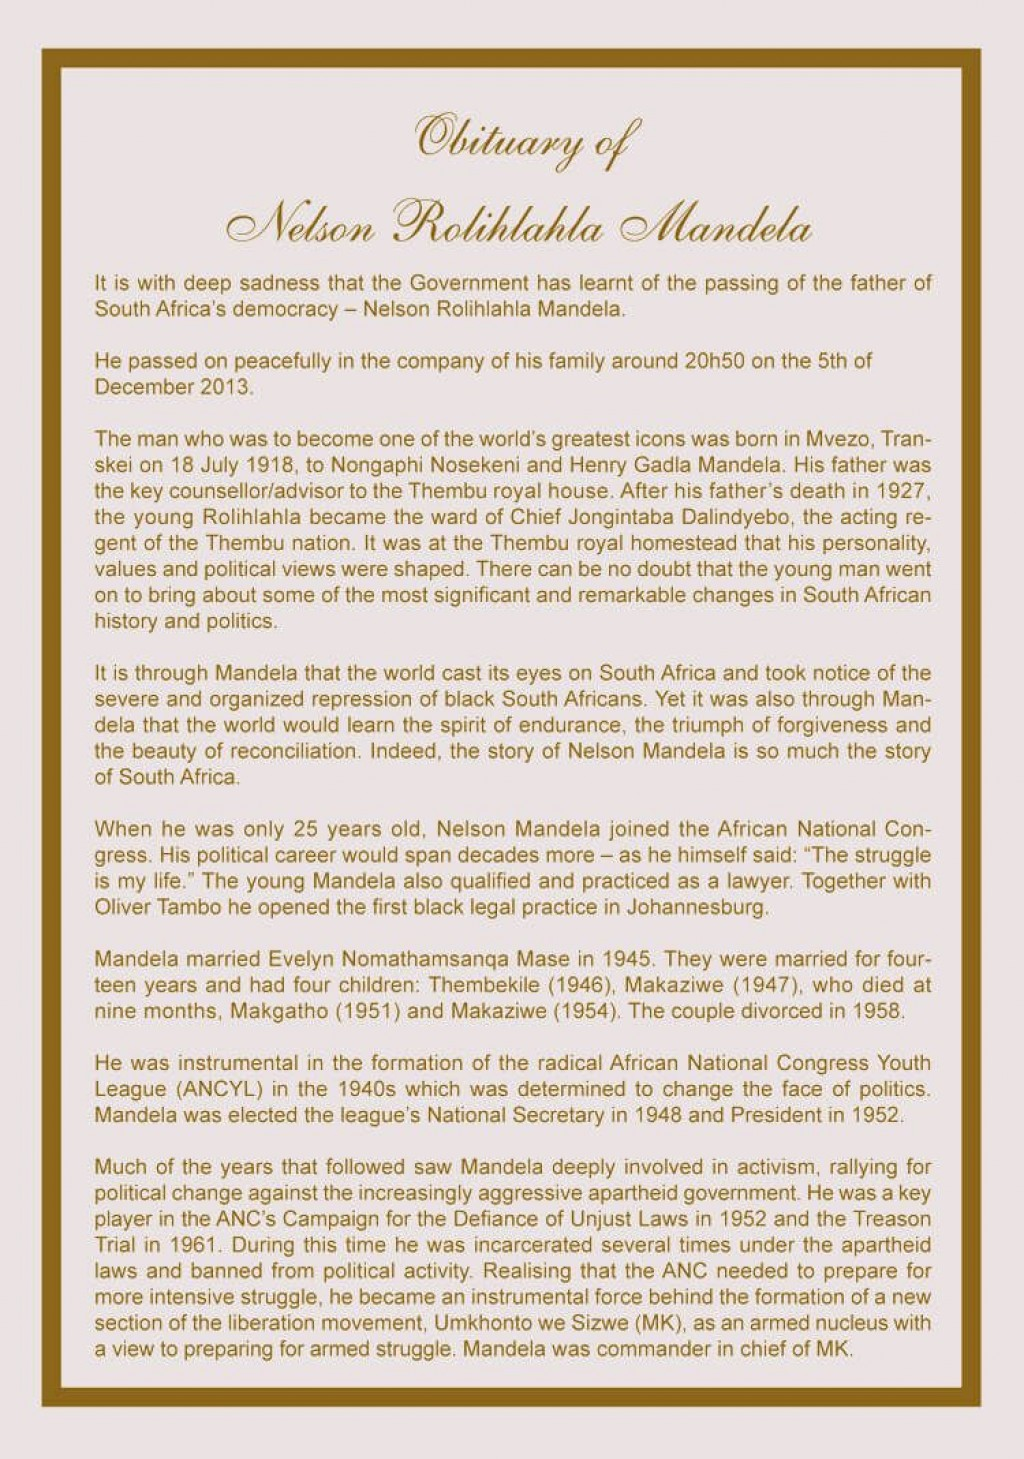 003 Impressive Template For Funeral Program On Word Highest Quality  2010 Free Sample WordingLarge